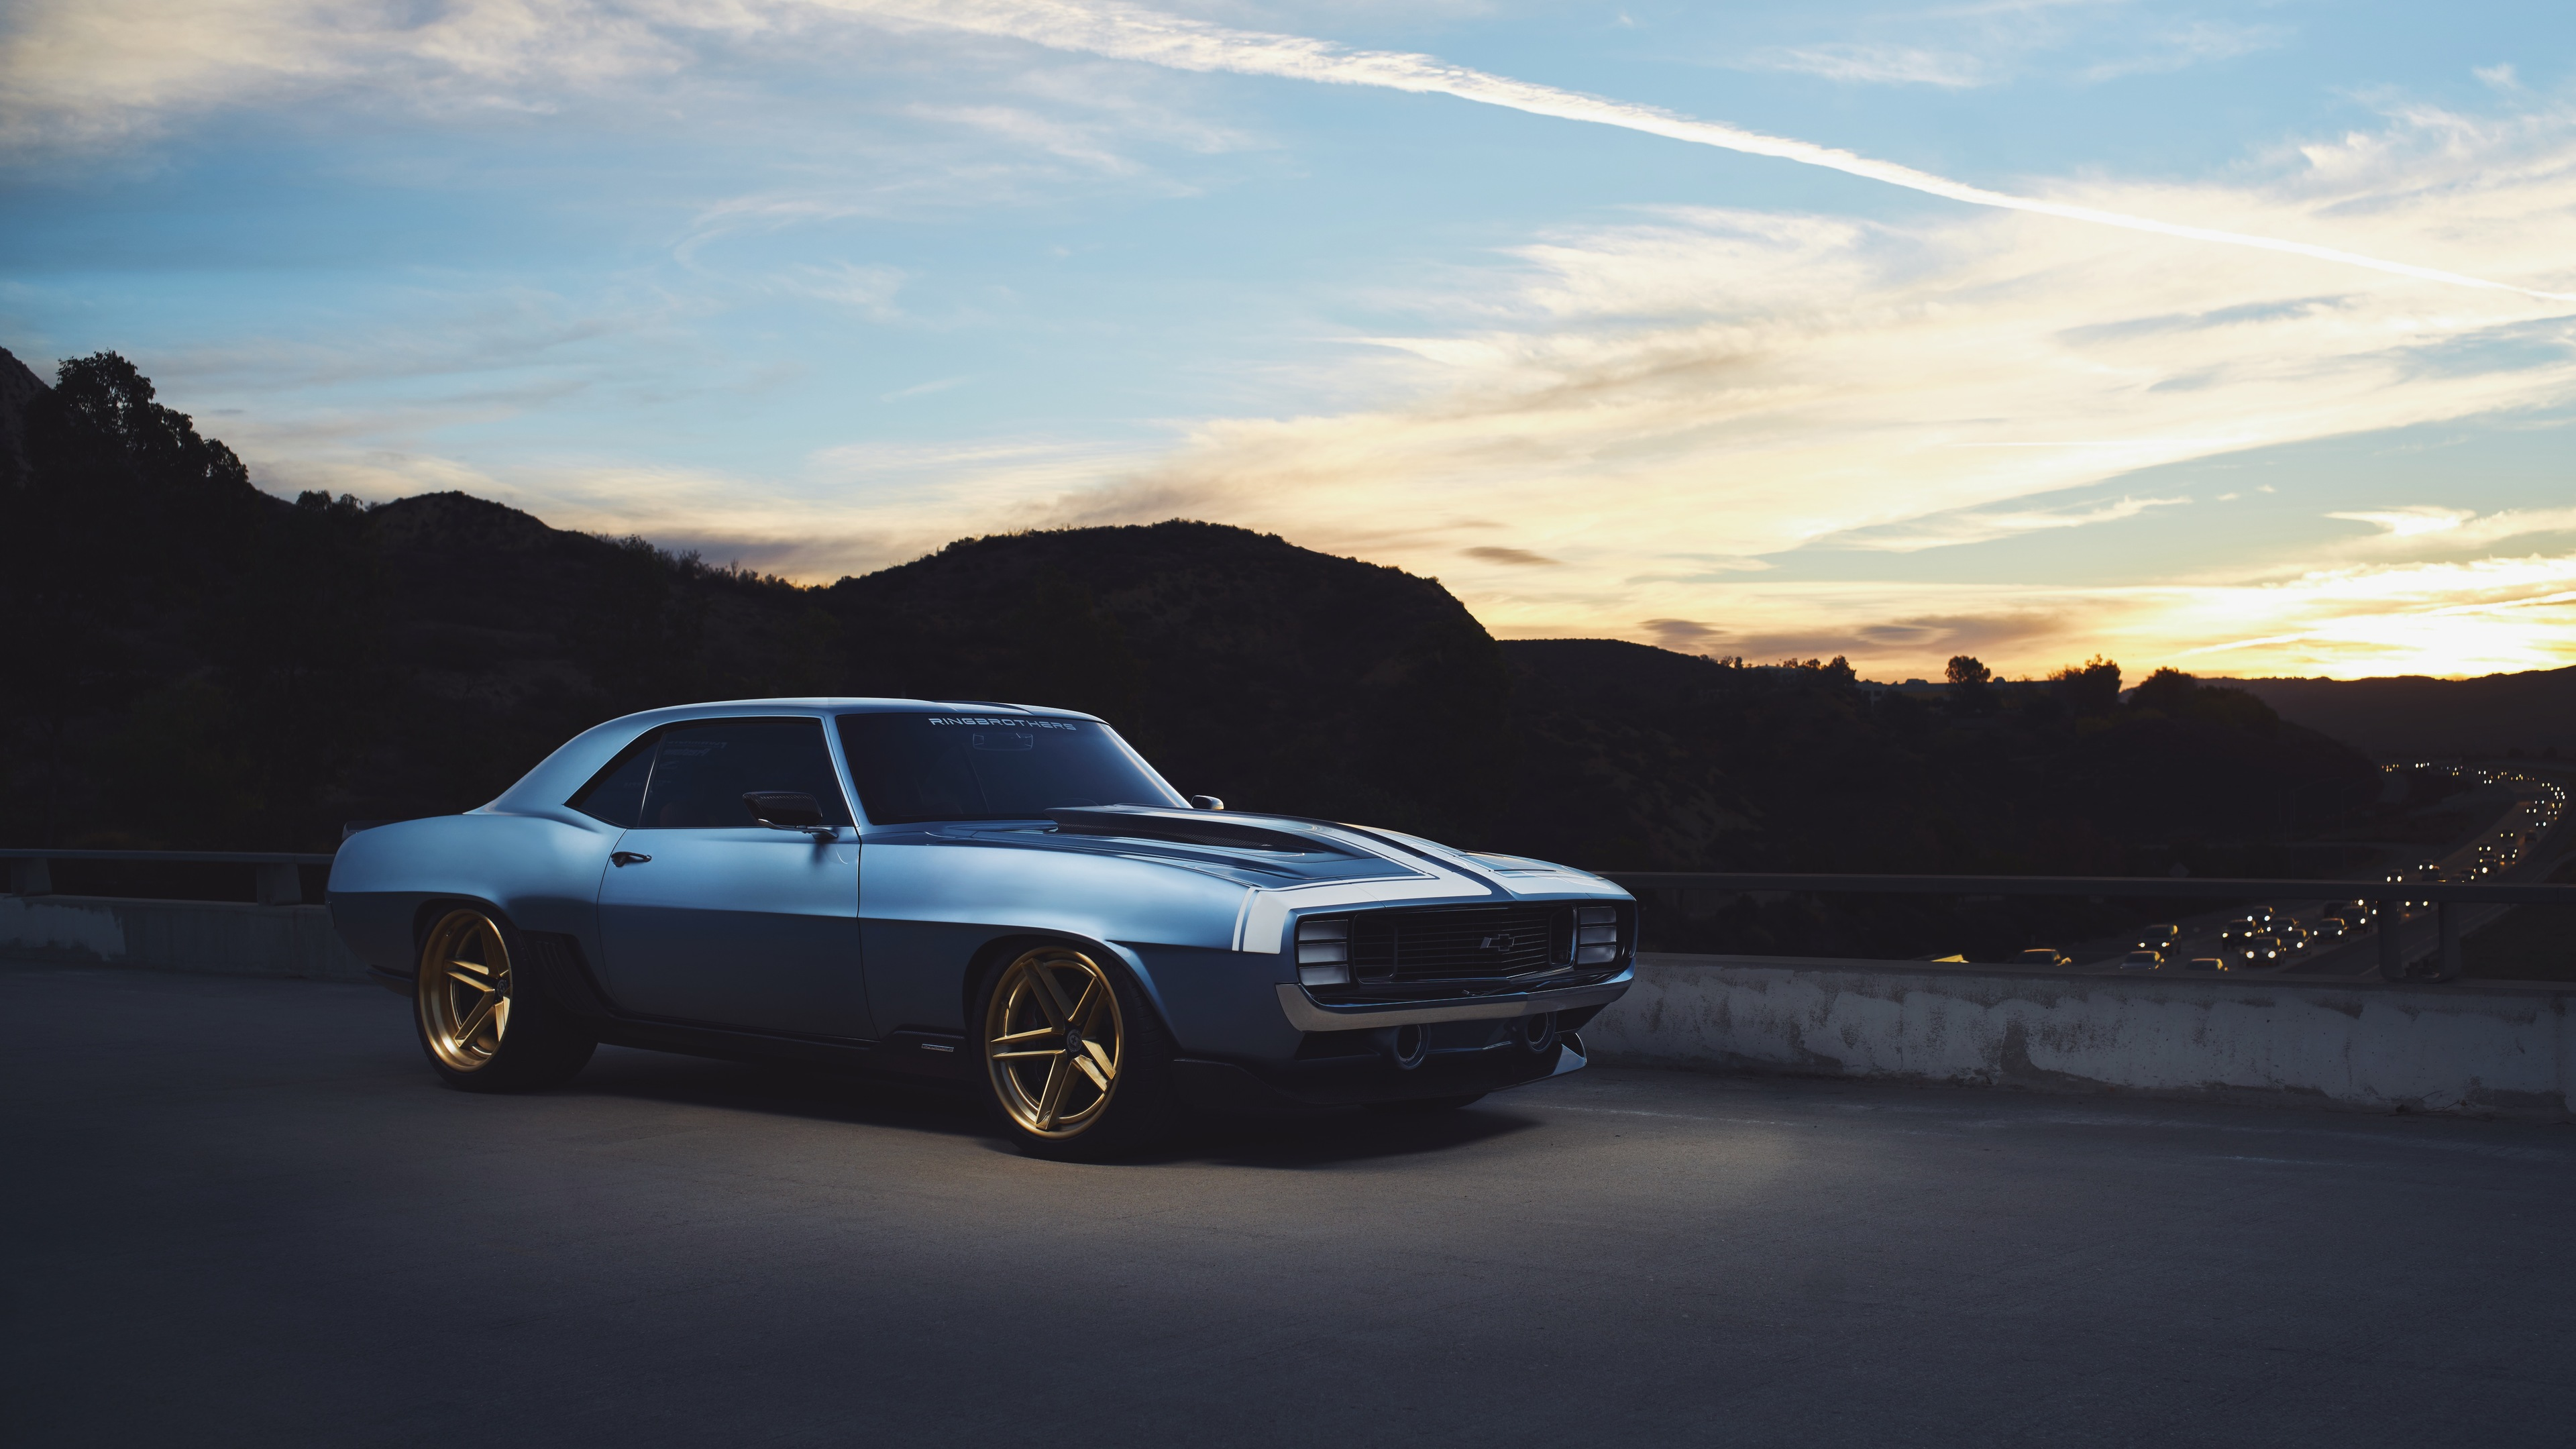 1969 chevrolet camaro g code 4k 1557260855 - 1969 Chevrolet Camaro G Code 4k - hd-wallpapers, chevrolet wallpapers, cars wallpapers, camaro wallpapers, 4k-wallpapers